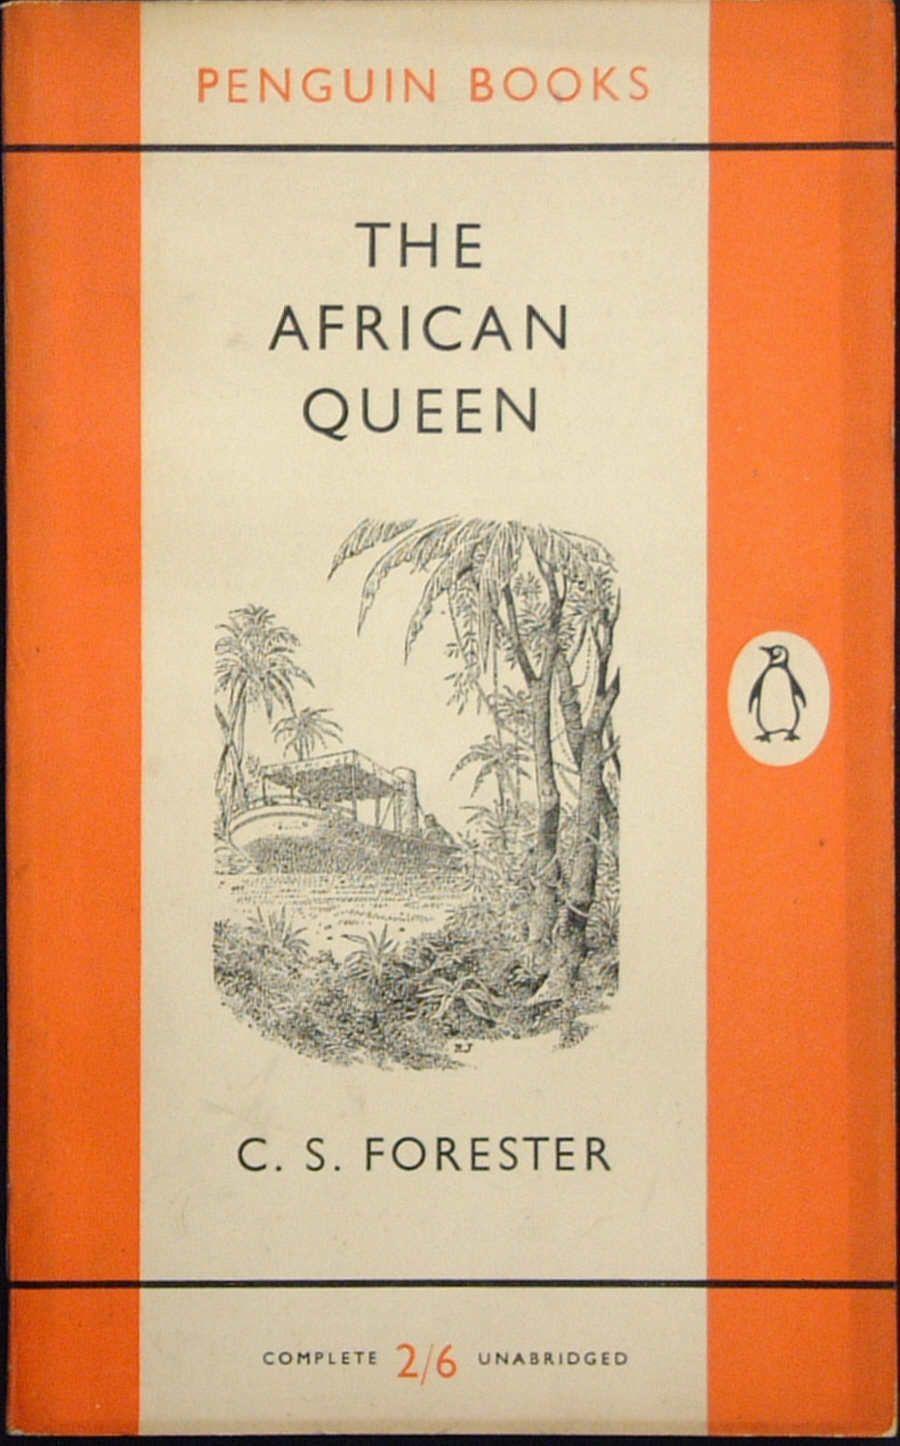 Pin by Matthias M on The Penguin Bookshelf In Orange and